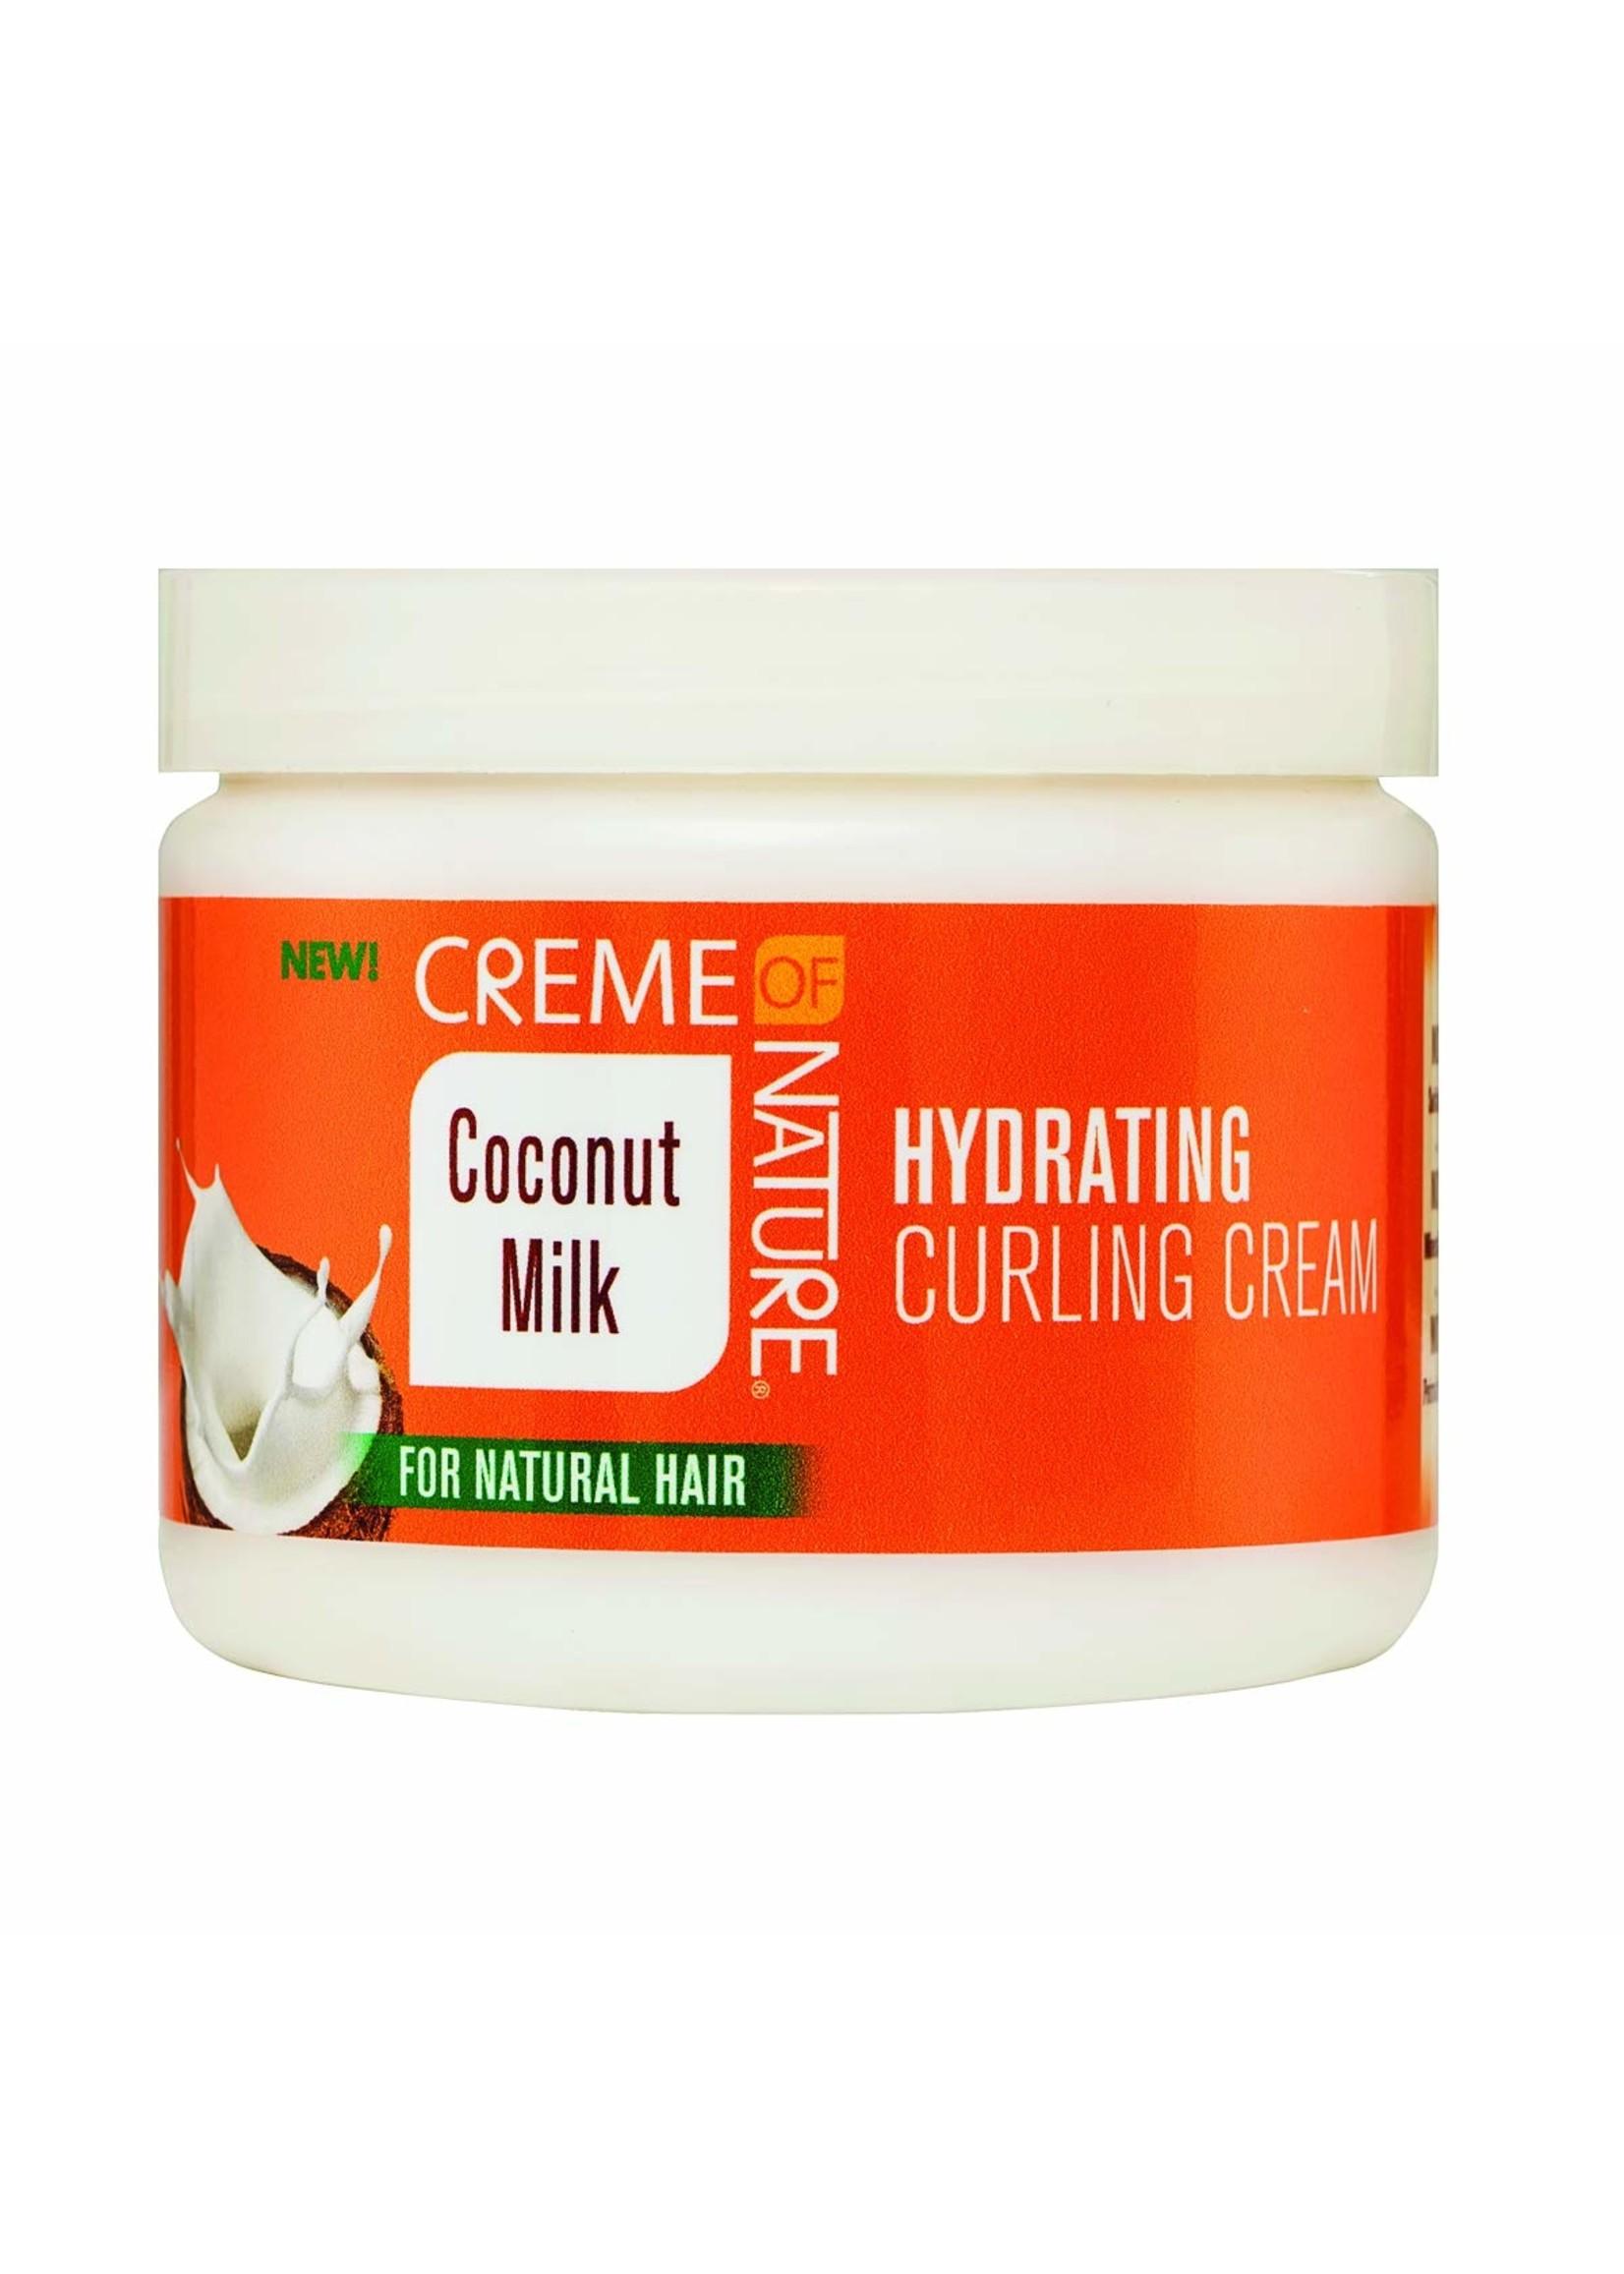 Creme of Nature Coconut Milk Hydrating Curling Cream